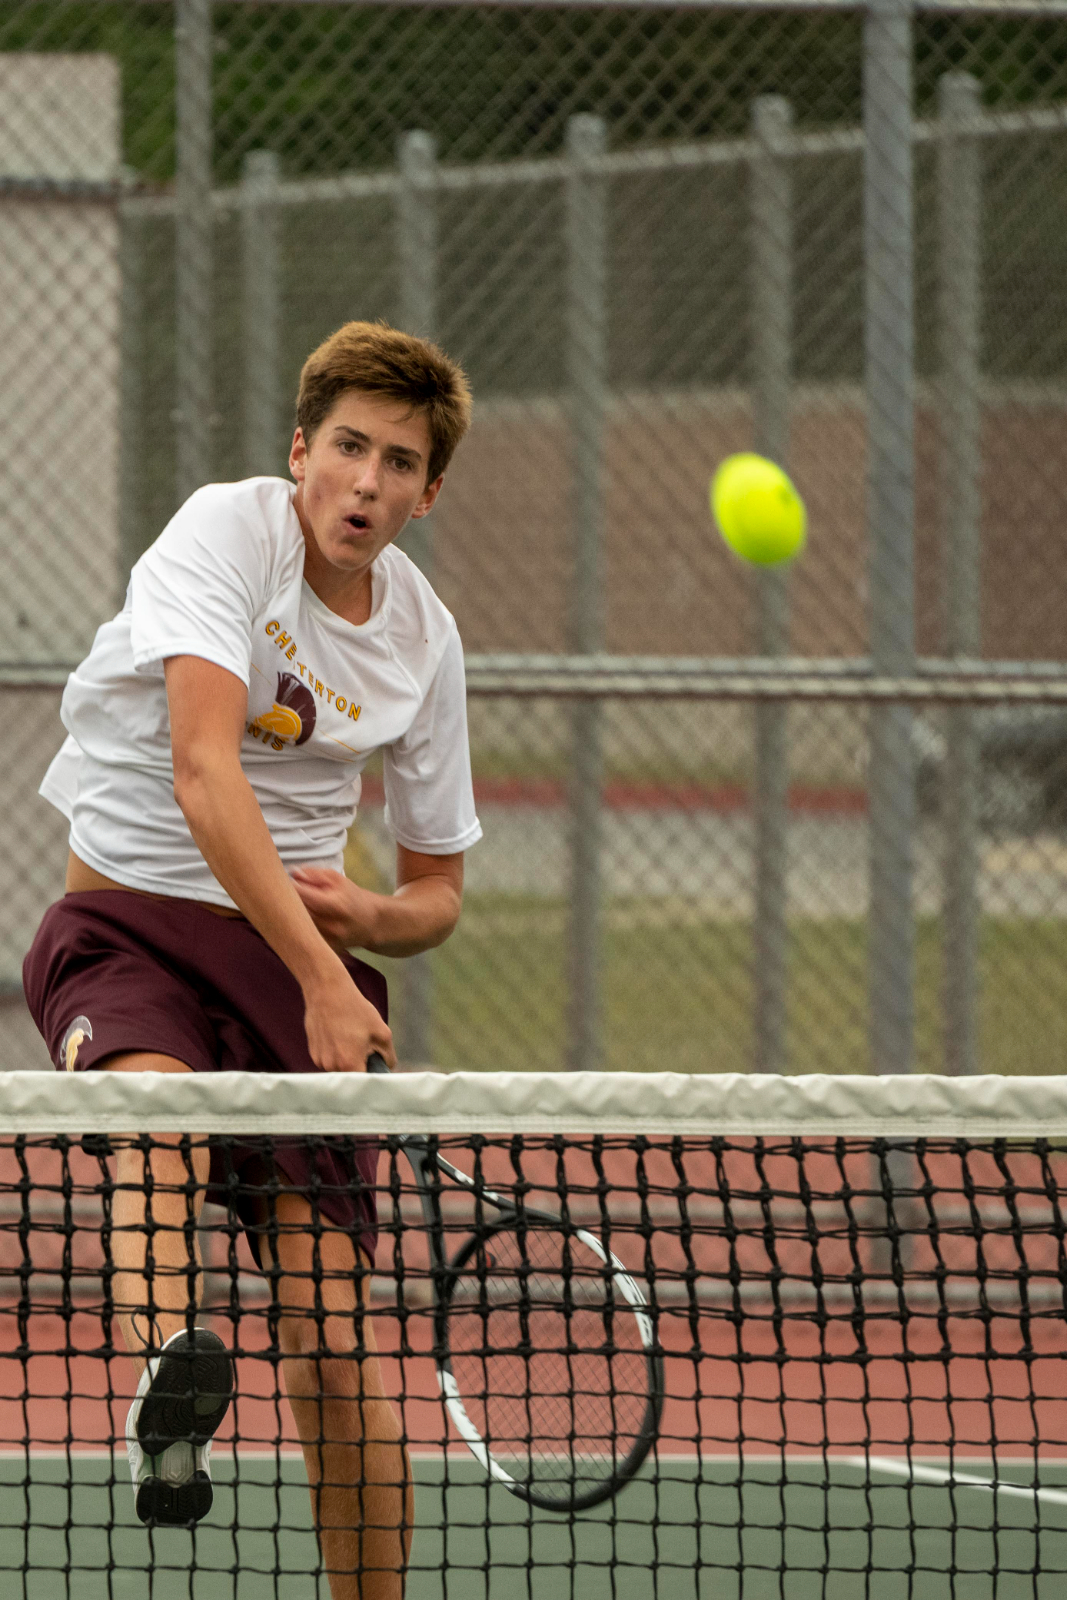 Boys Tennis, Penn Invitational Information 9/19